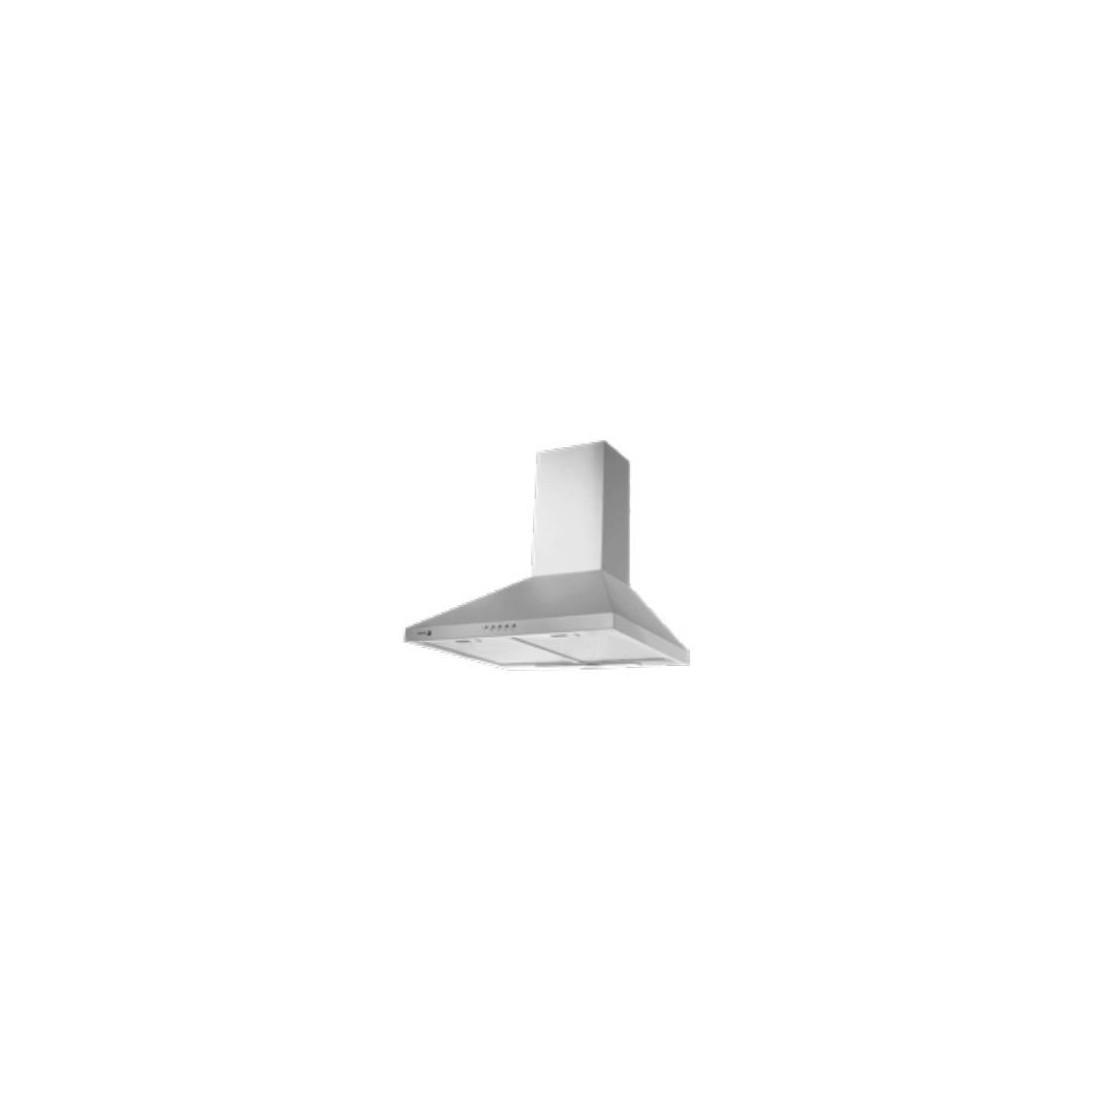 Campana Decorativa - Fagor 3CFP-6050X, Eficiencia A, Acero Inoxidable, T-Invertida